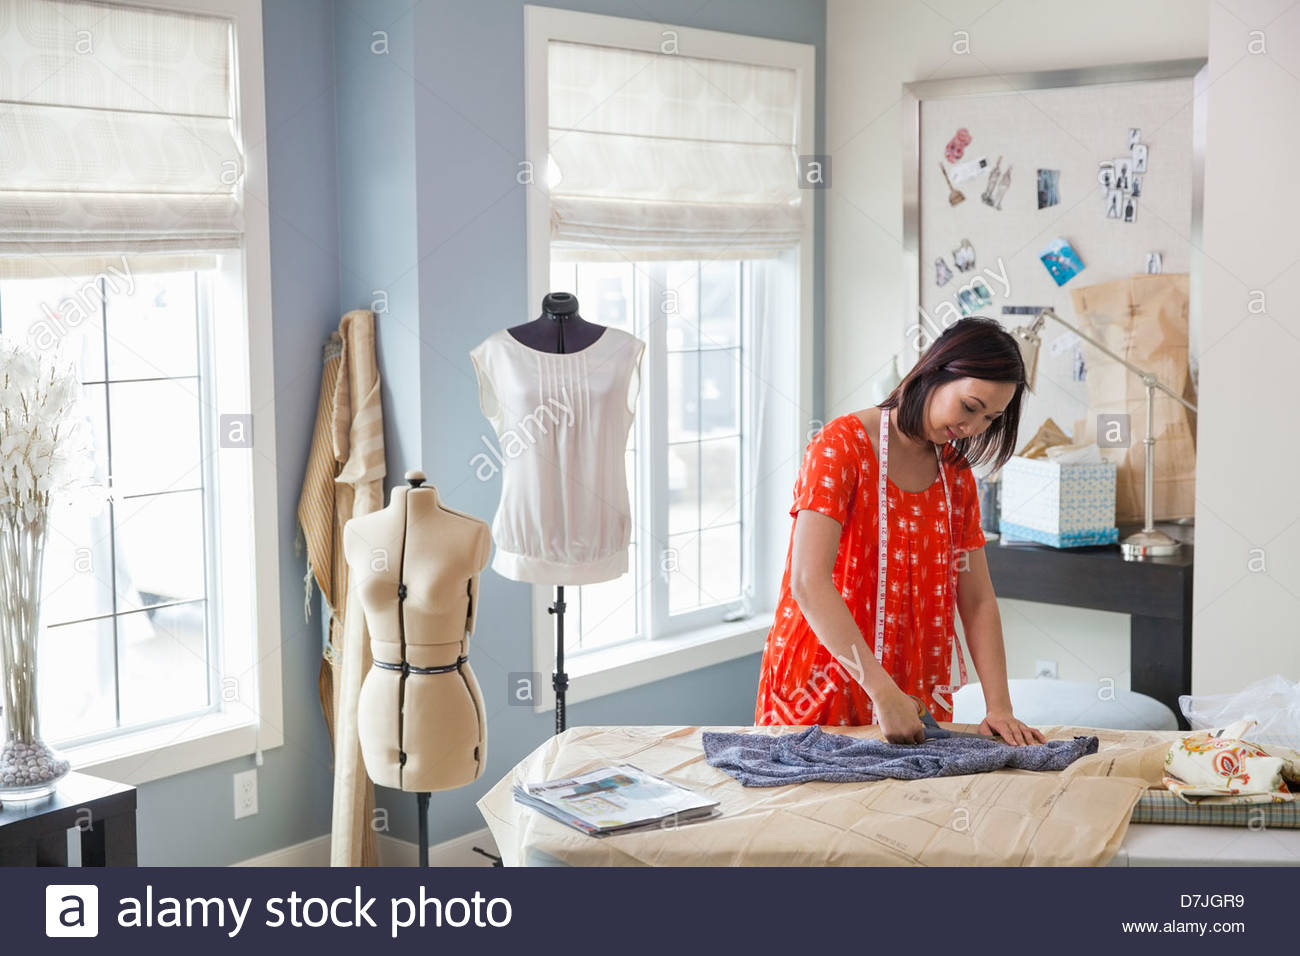 Female seamstress working in home studio Stock Photo: 56342029 - Alamy